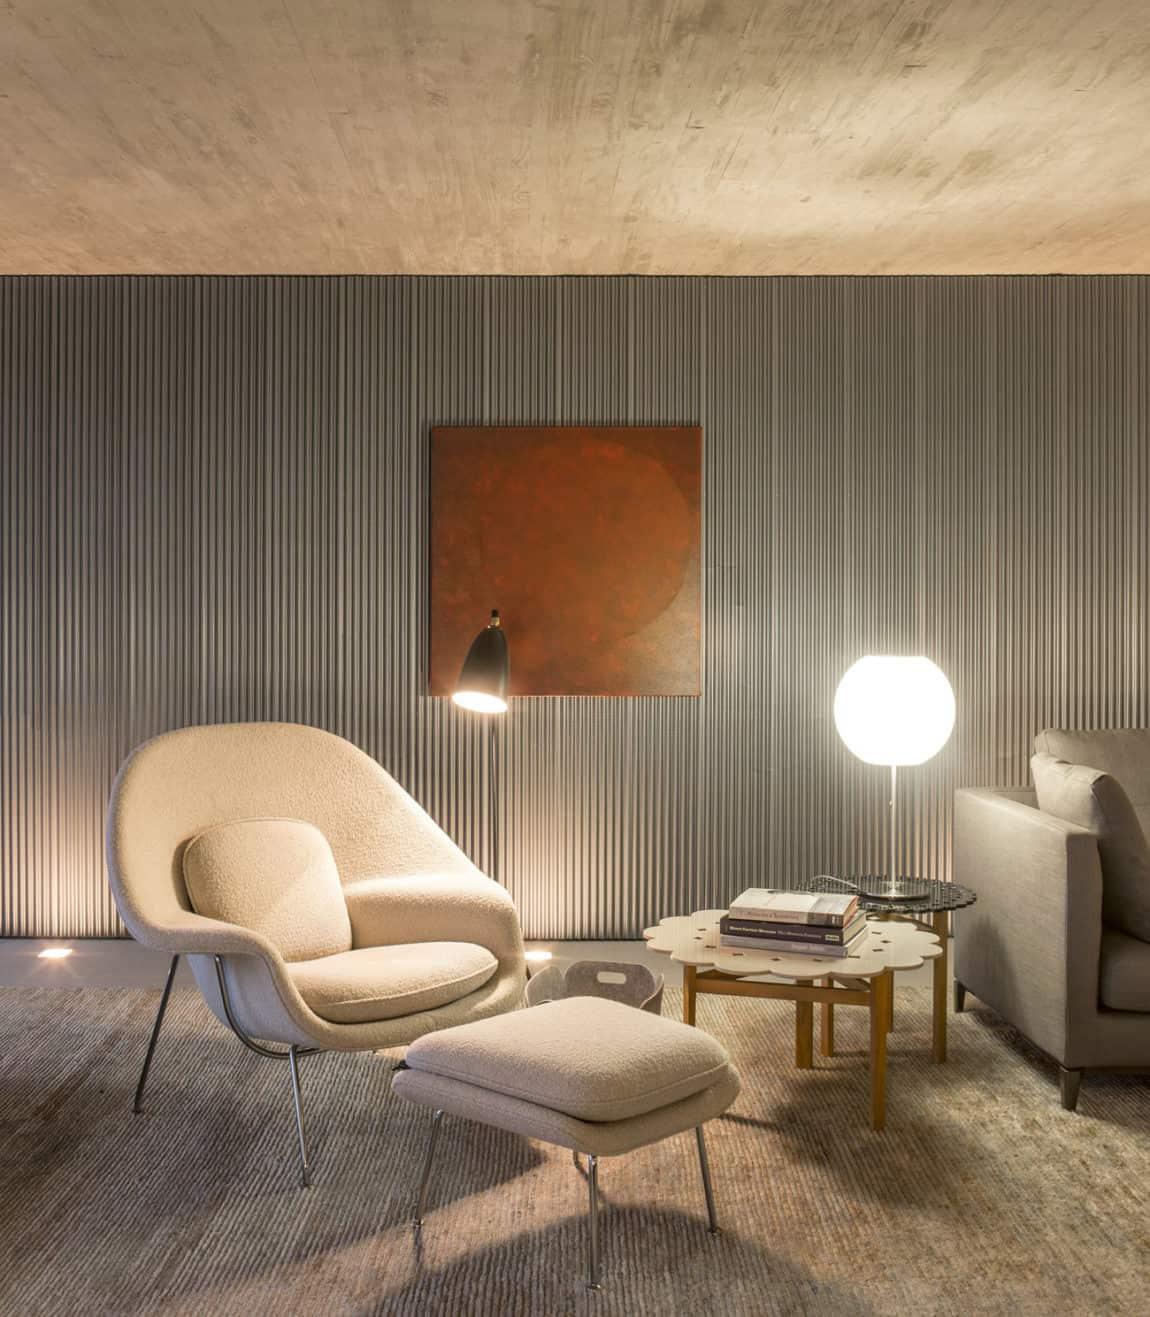 B+B House by studio mk27 & Galeria Arquitetos (24)